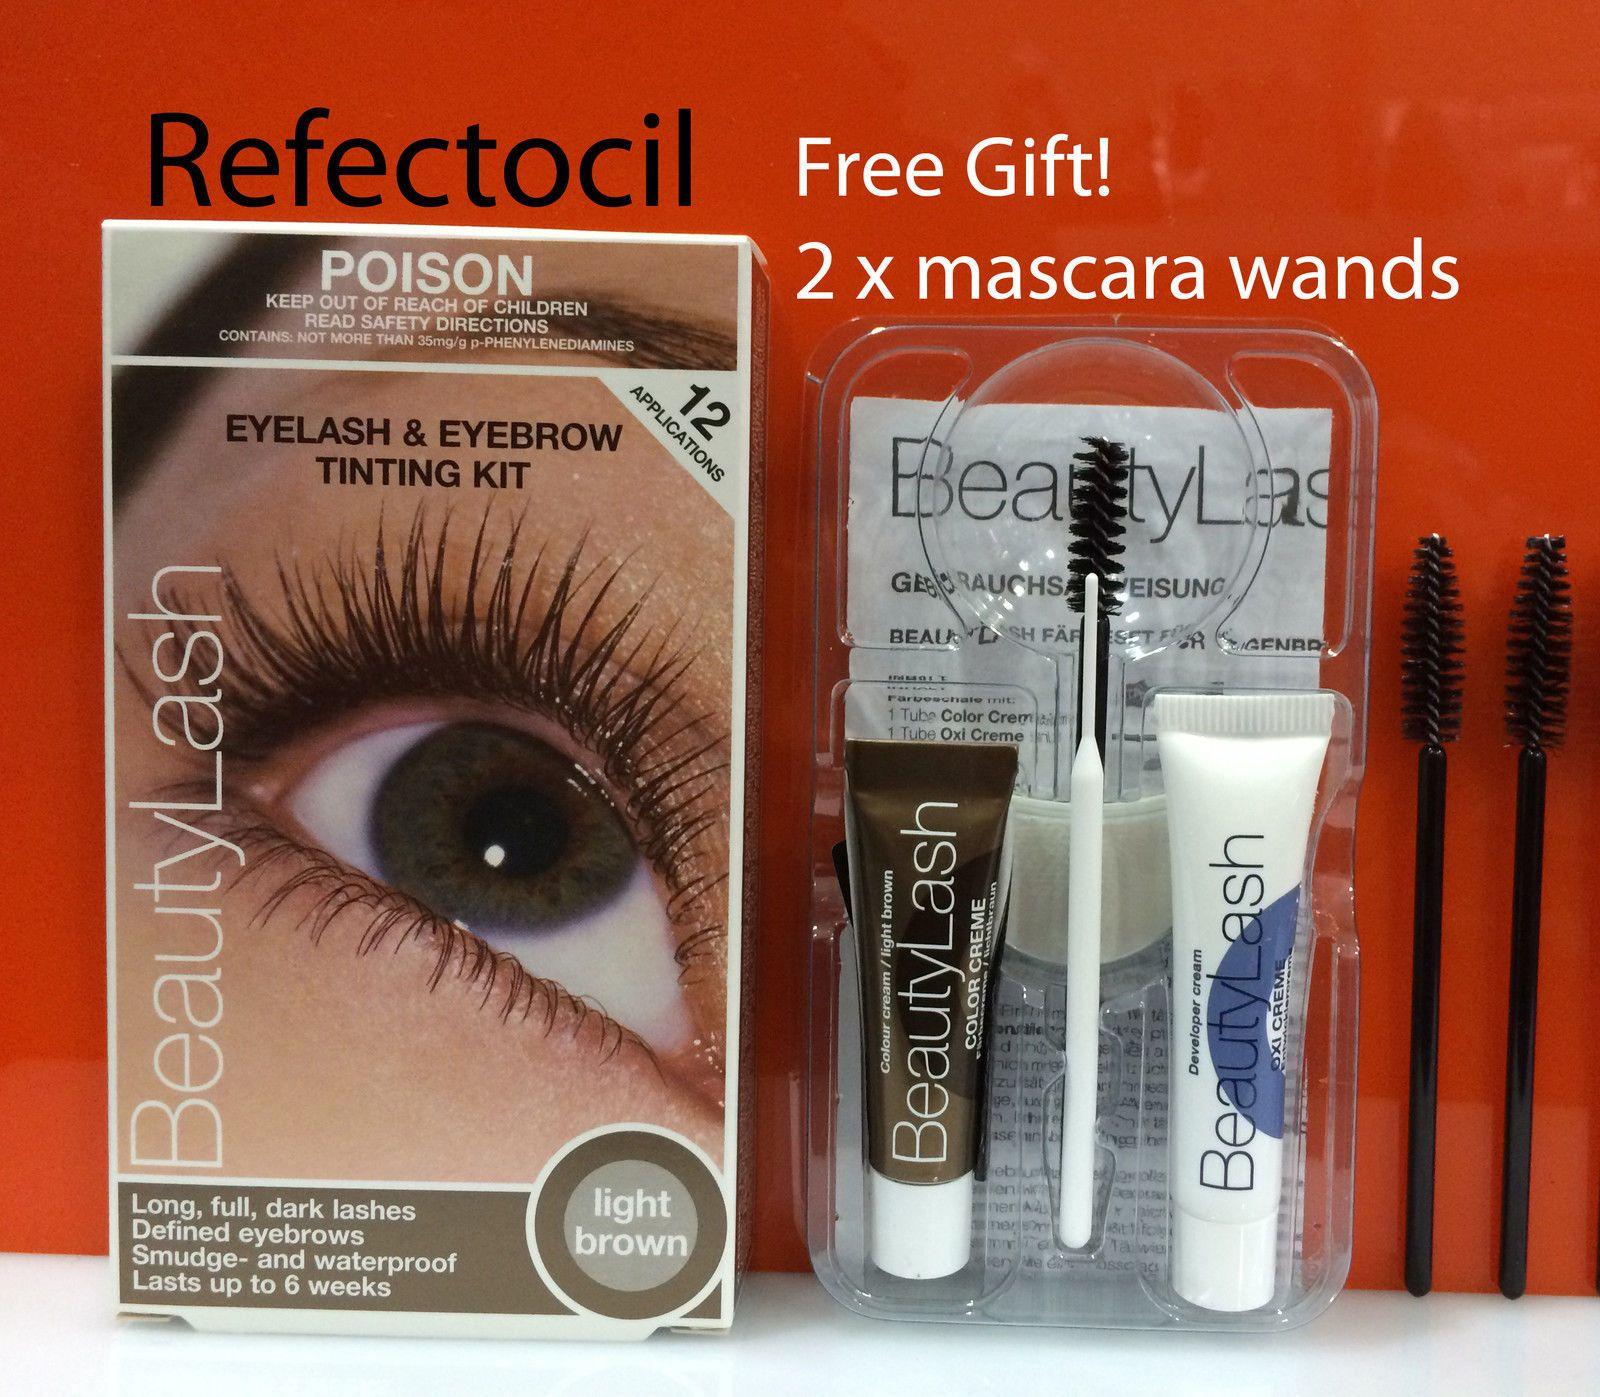 Refectocil Beautylash Eyelash Eyebrow Tint Kit Light Brown No